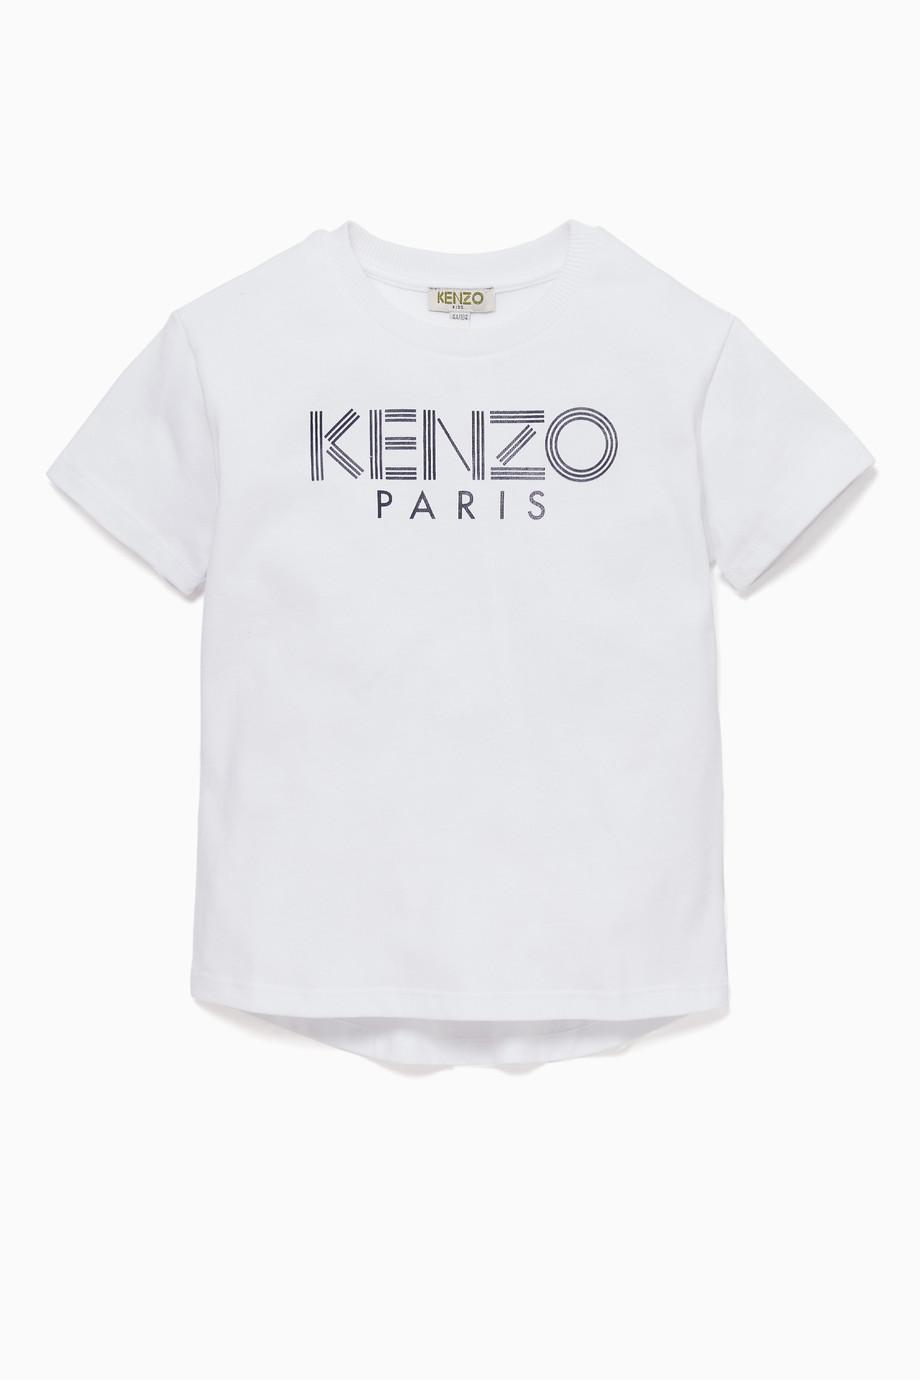 2c050e76d Shop Kenzo White Graphic Logo Print T-Shirt for Kids   Ounass Kuwait